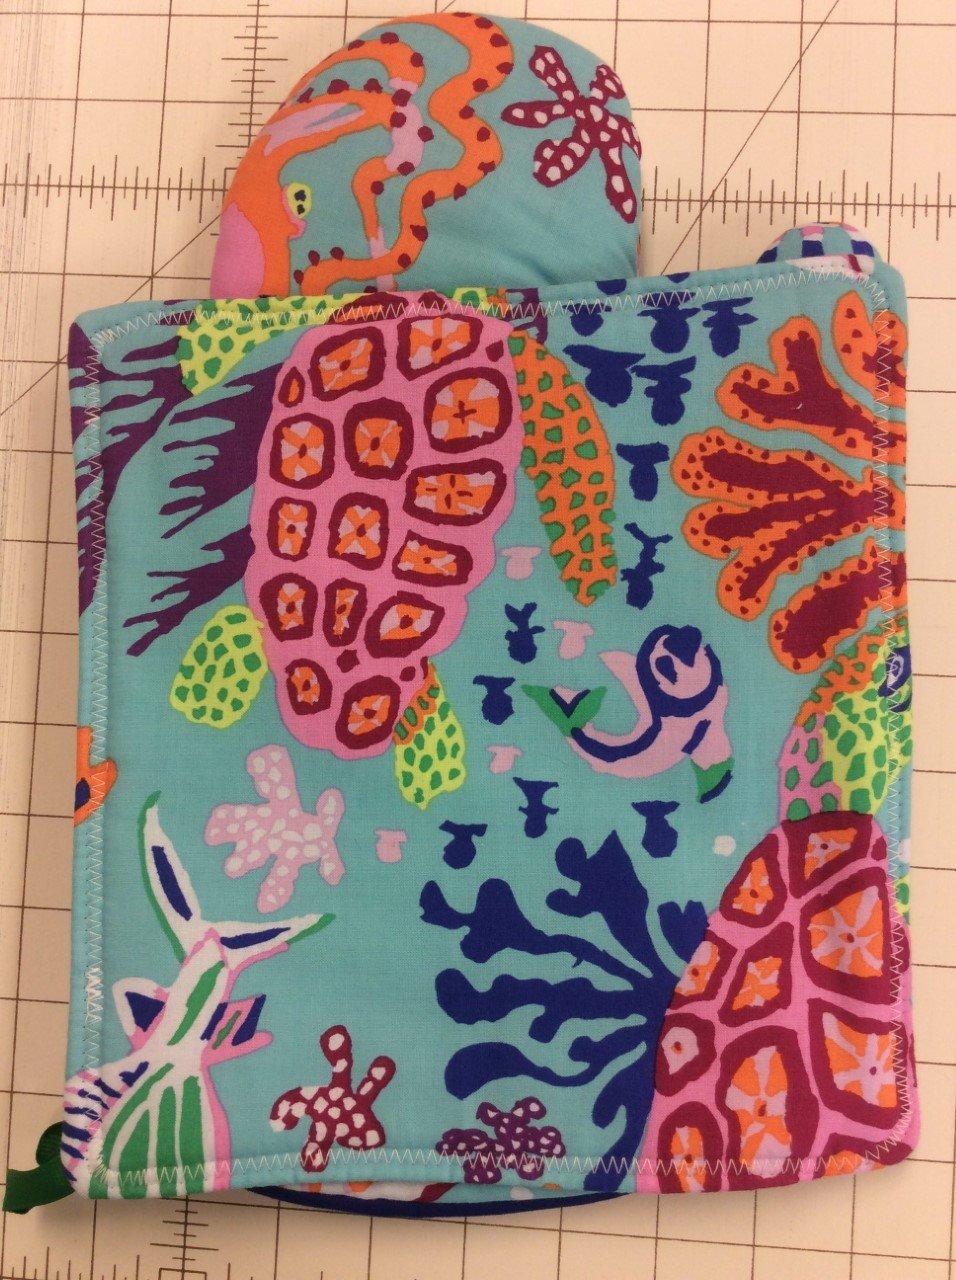 Oven Mitt&Hotpad Set-Colorful Sealife